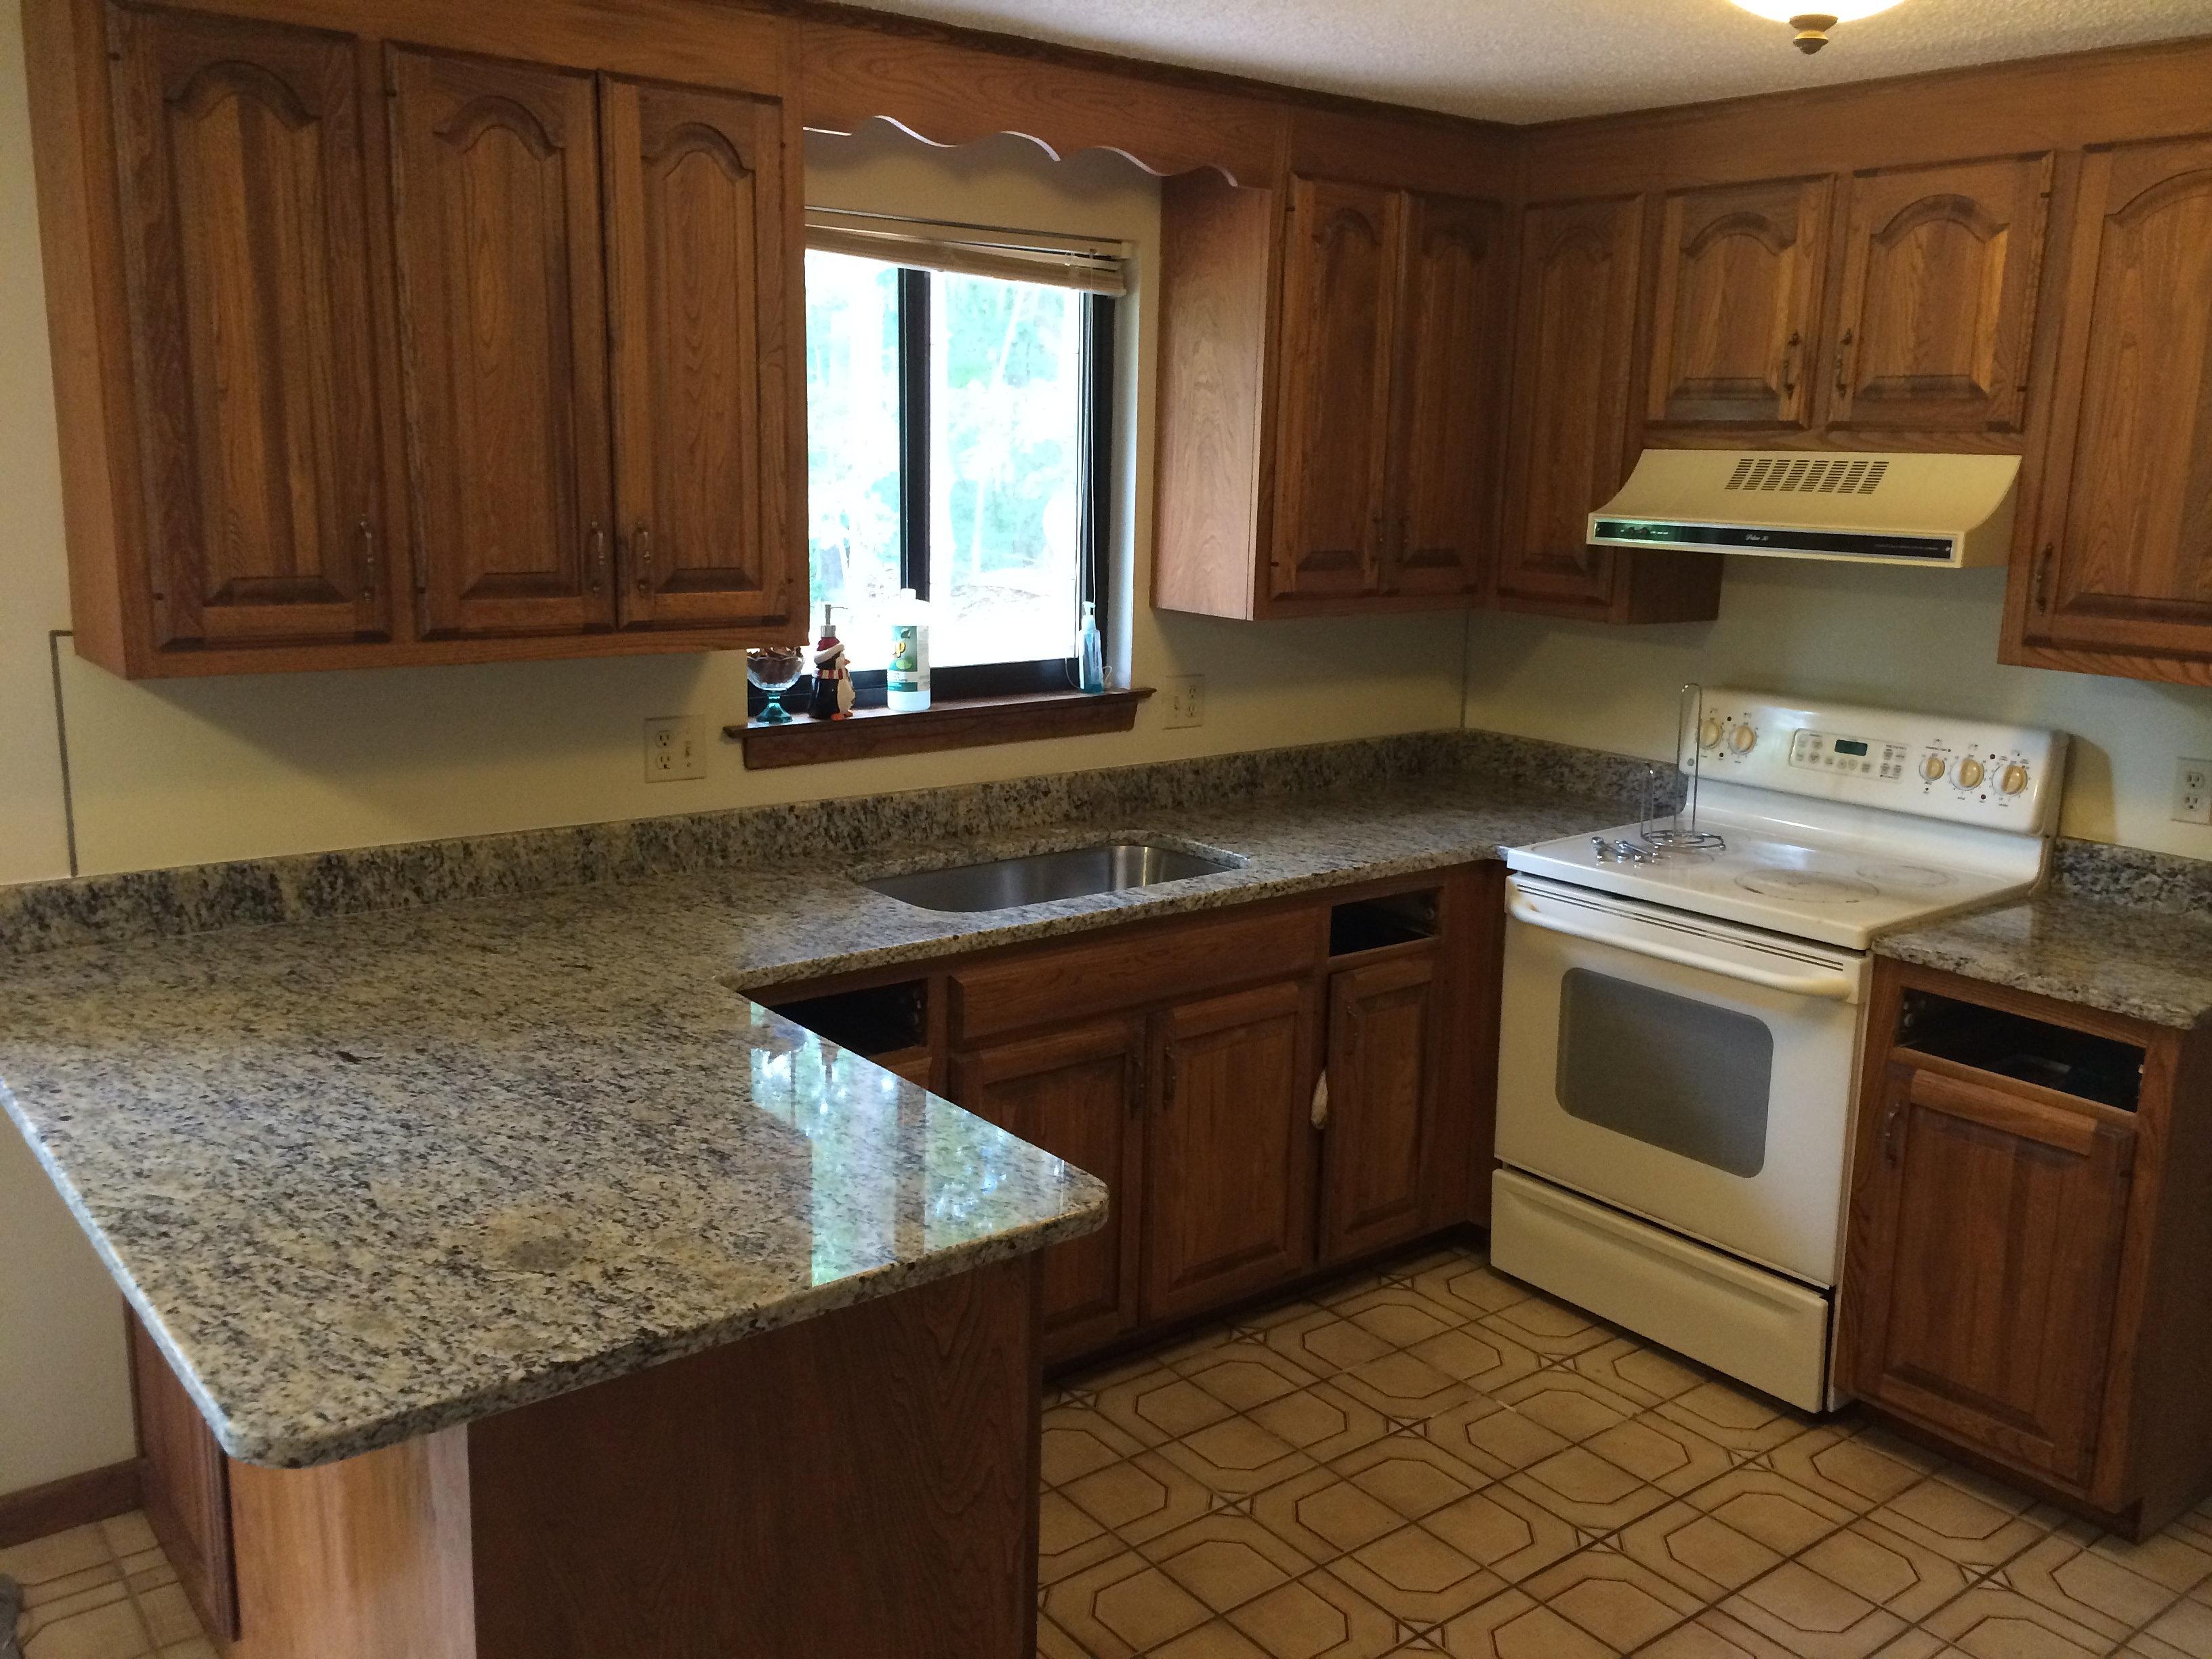 St Cecilia Light Granite Kitchens New England Granite Cabinets Kitchen Countertops Granite St